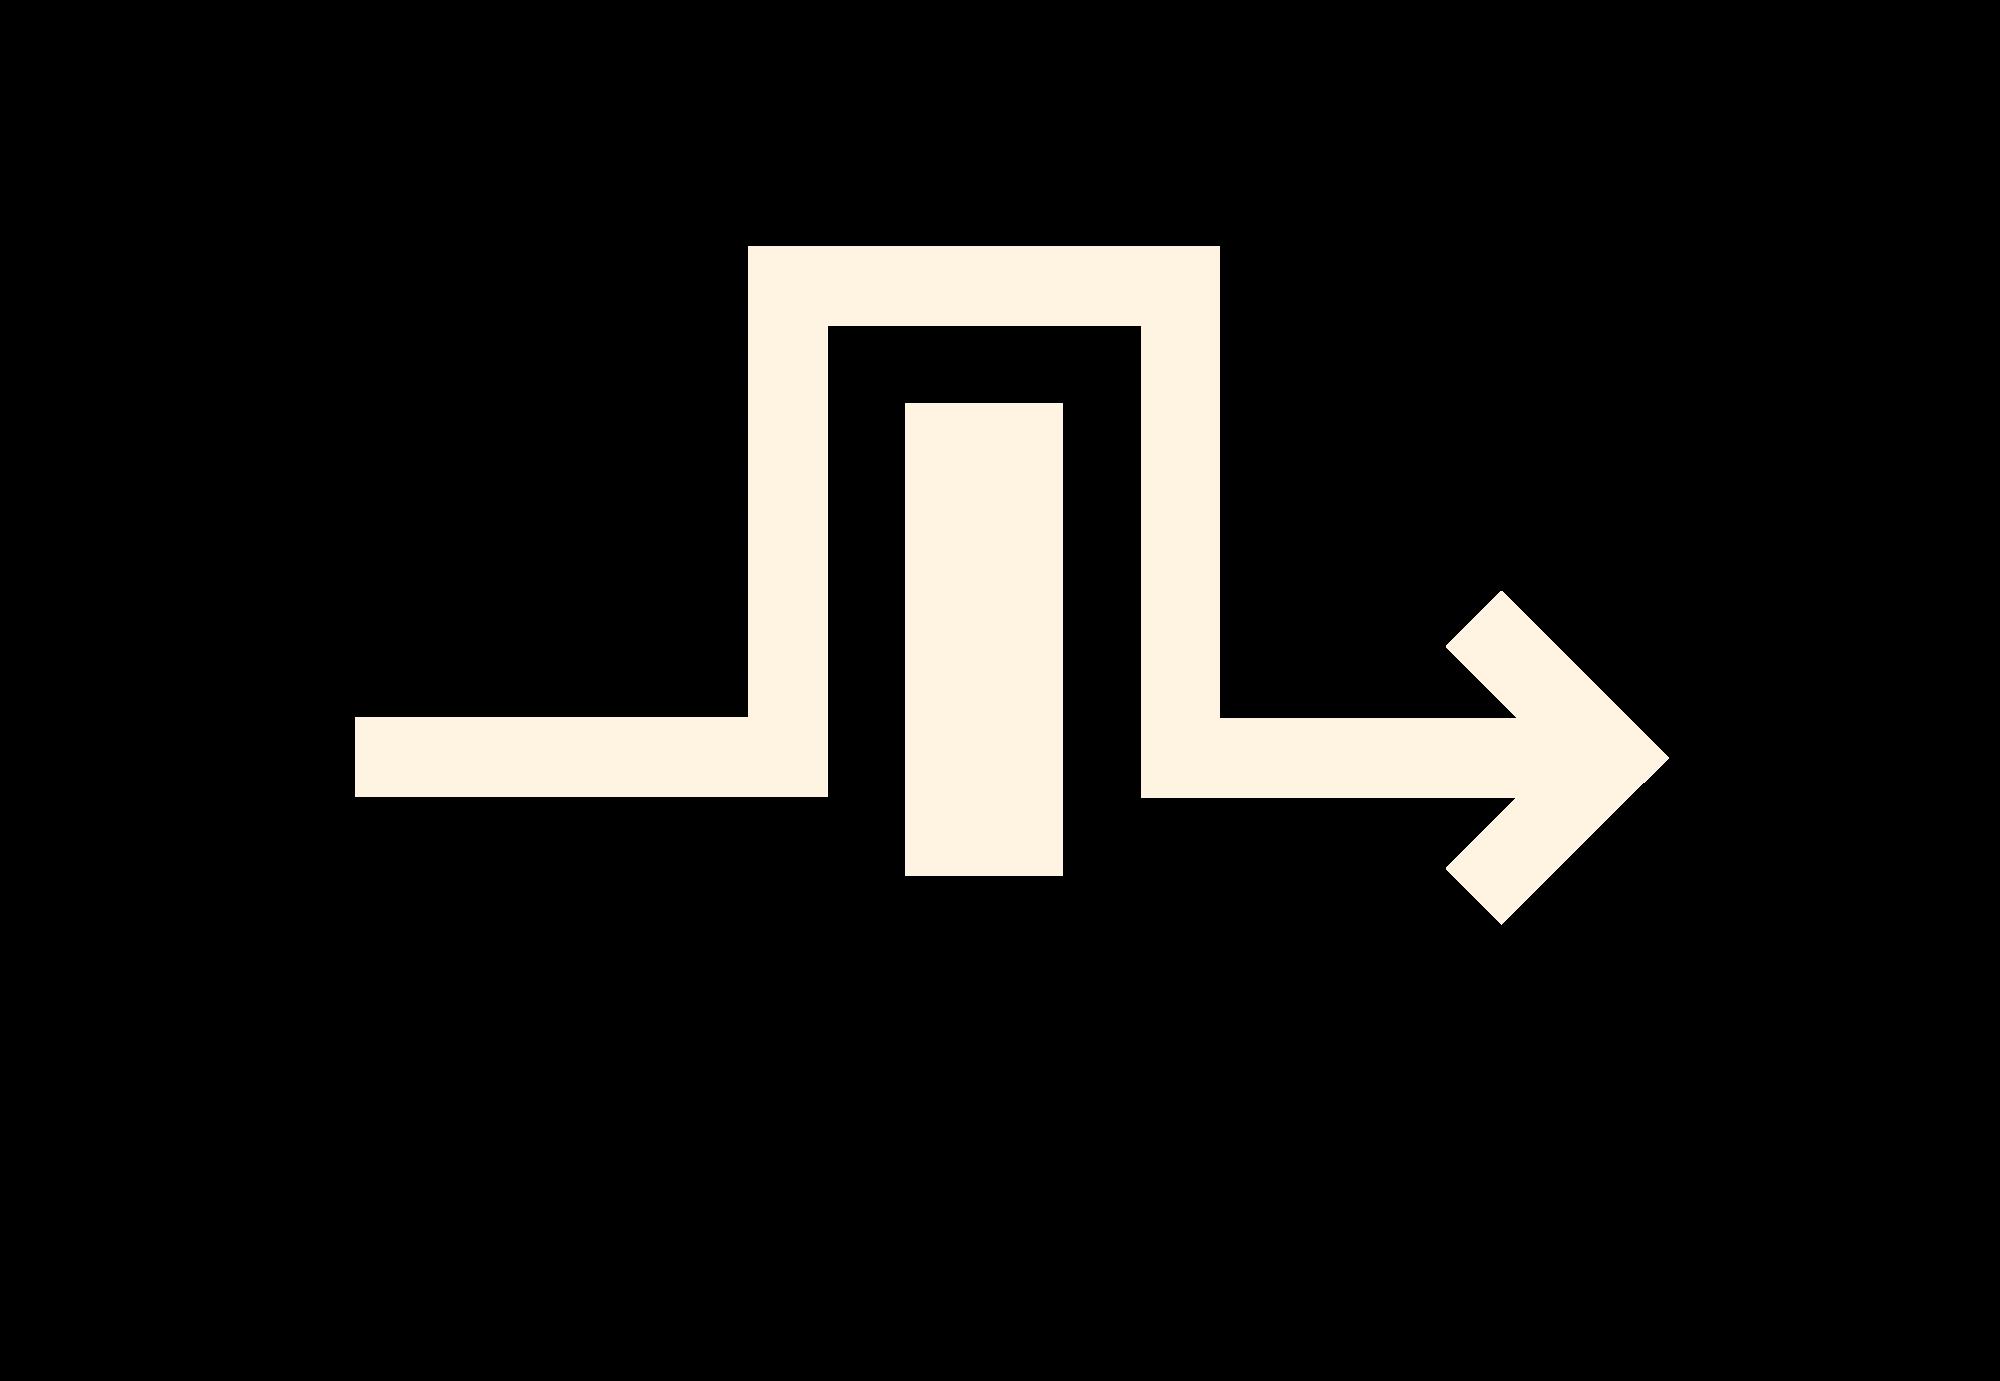 Copy of Copy of MONET VENTURES